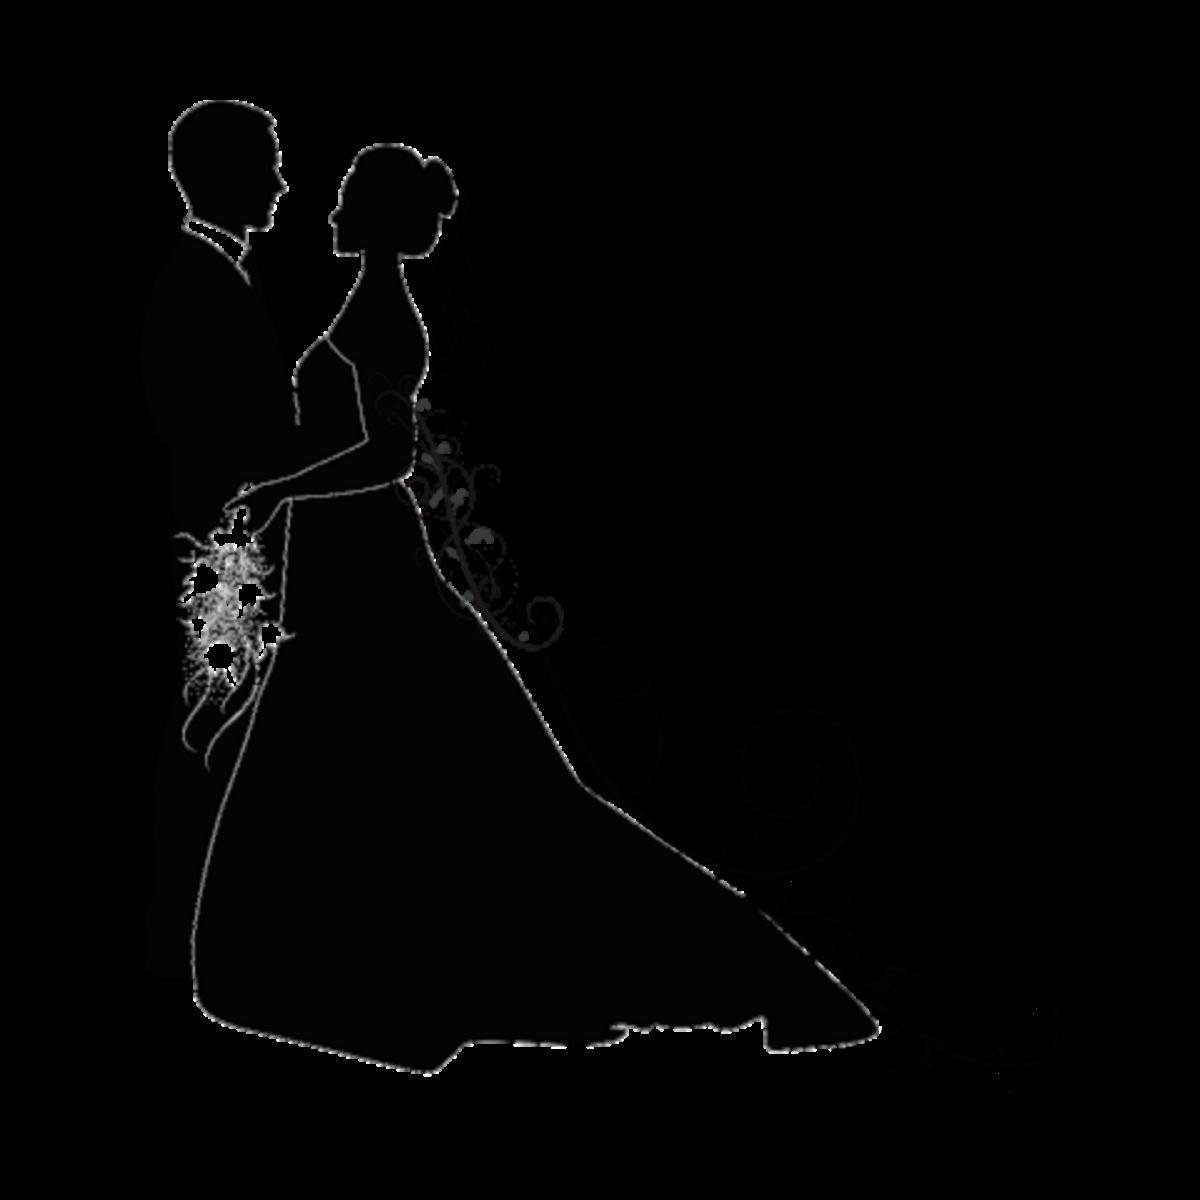 Gambar Hitam Putih Wedding Wwwtollebildcom